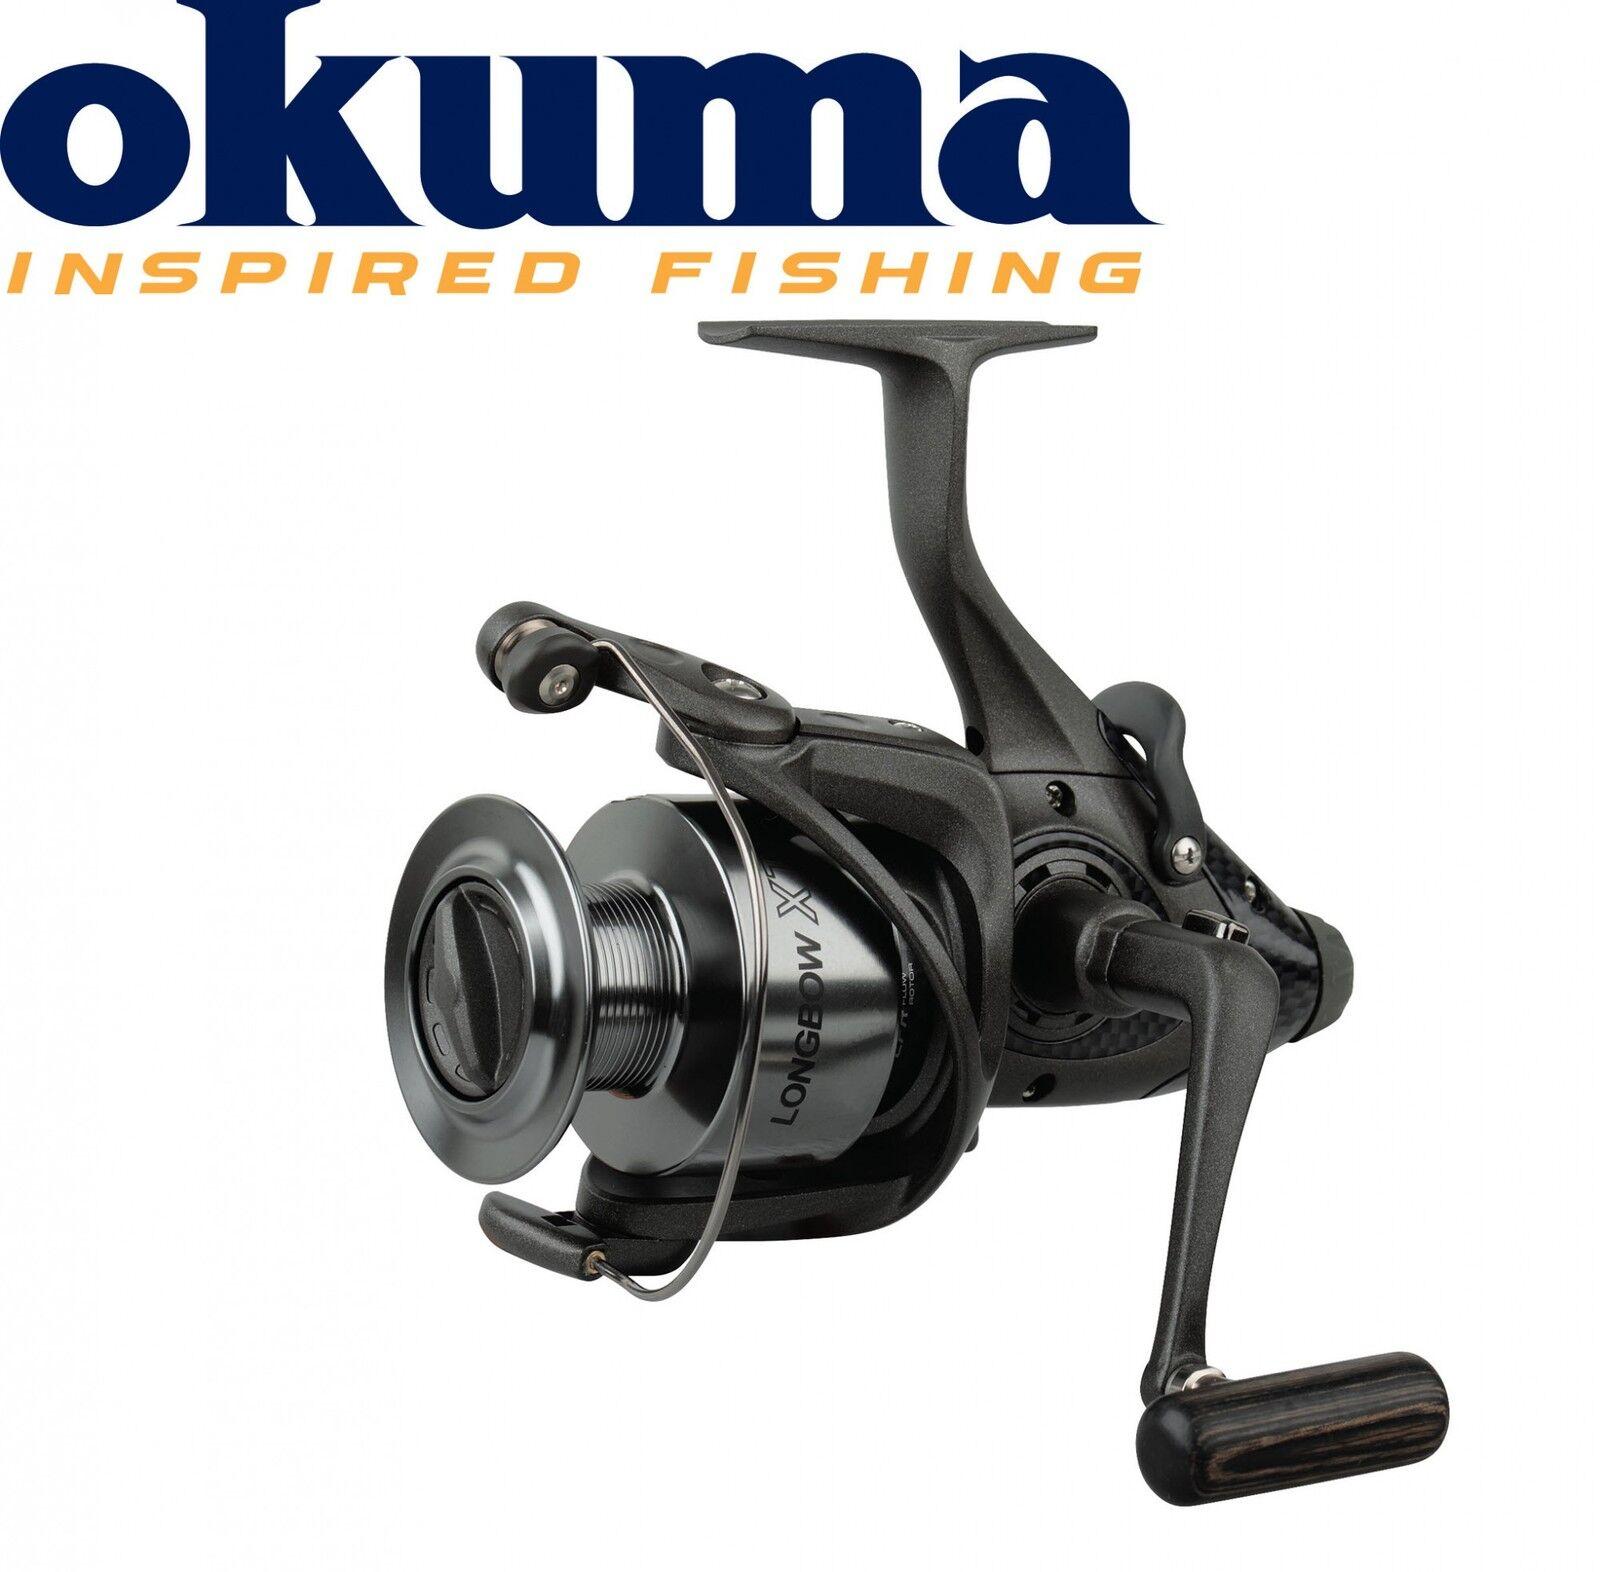 Okuma Okuma Okuma Longbow XT Baitfeeder 655– 325m 0,30mm Schnurfassung Freilaufrolle fa81b8